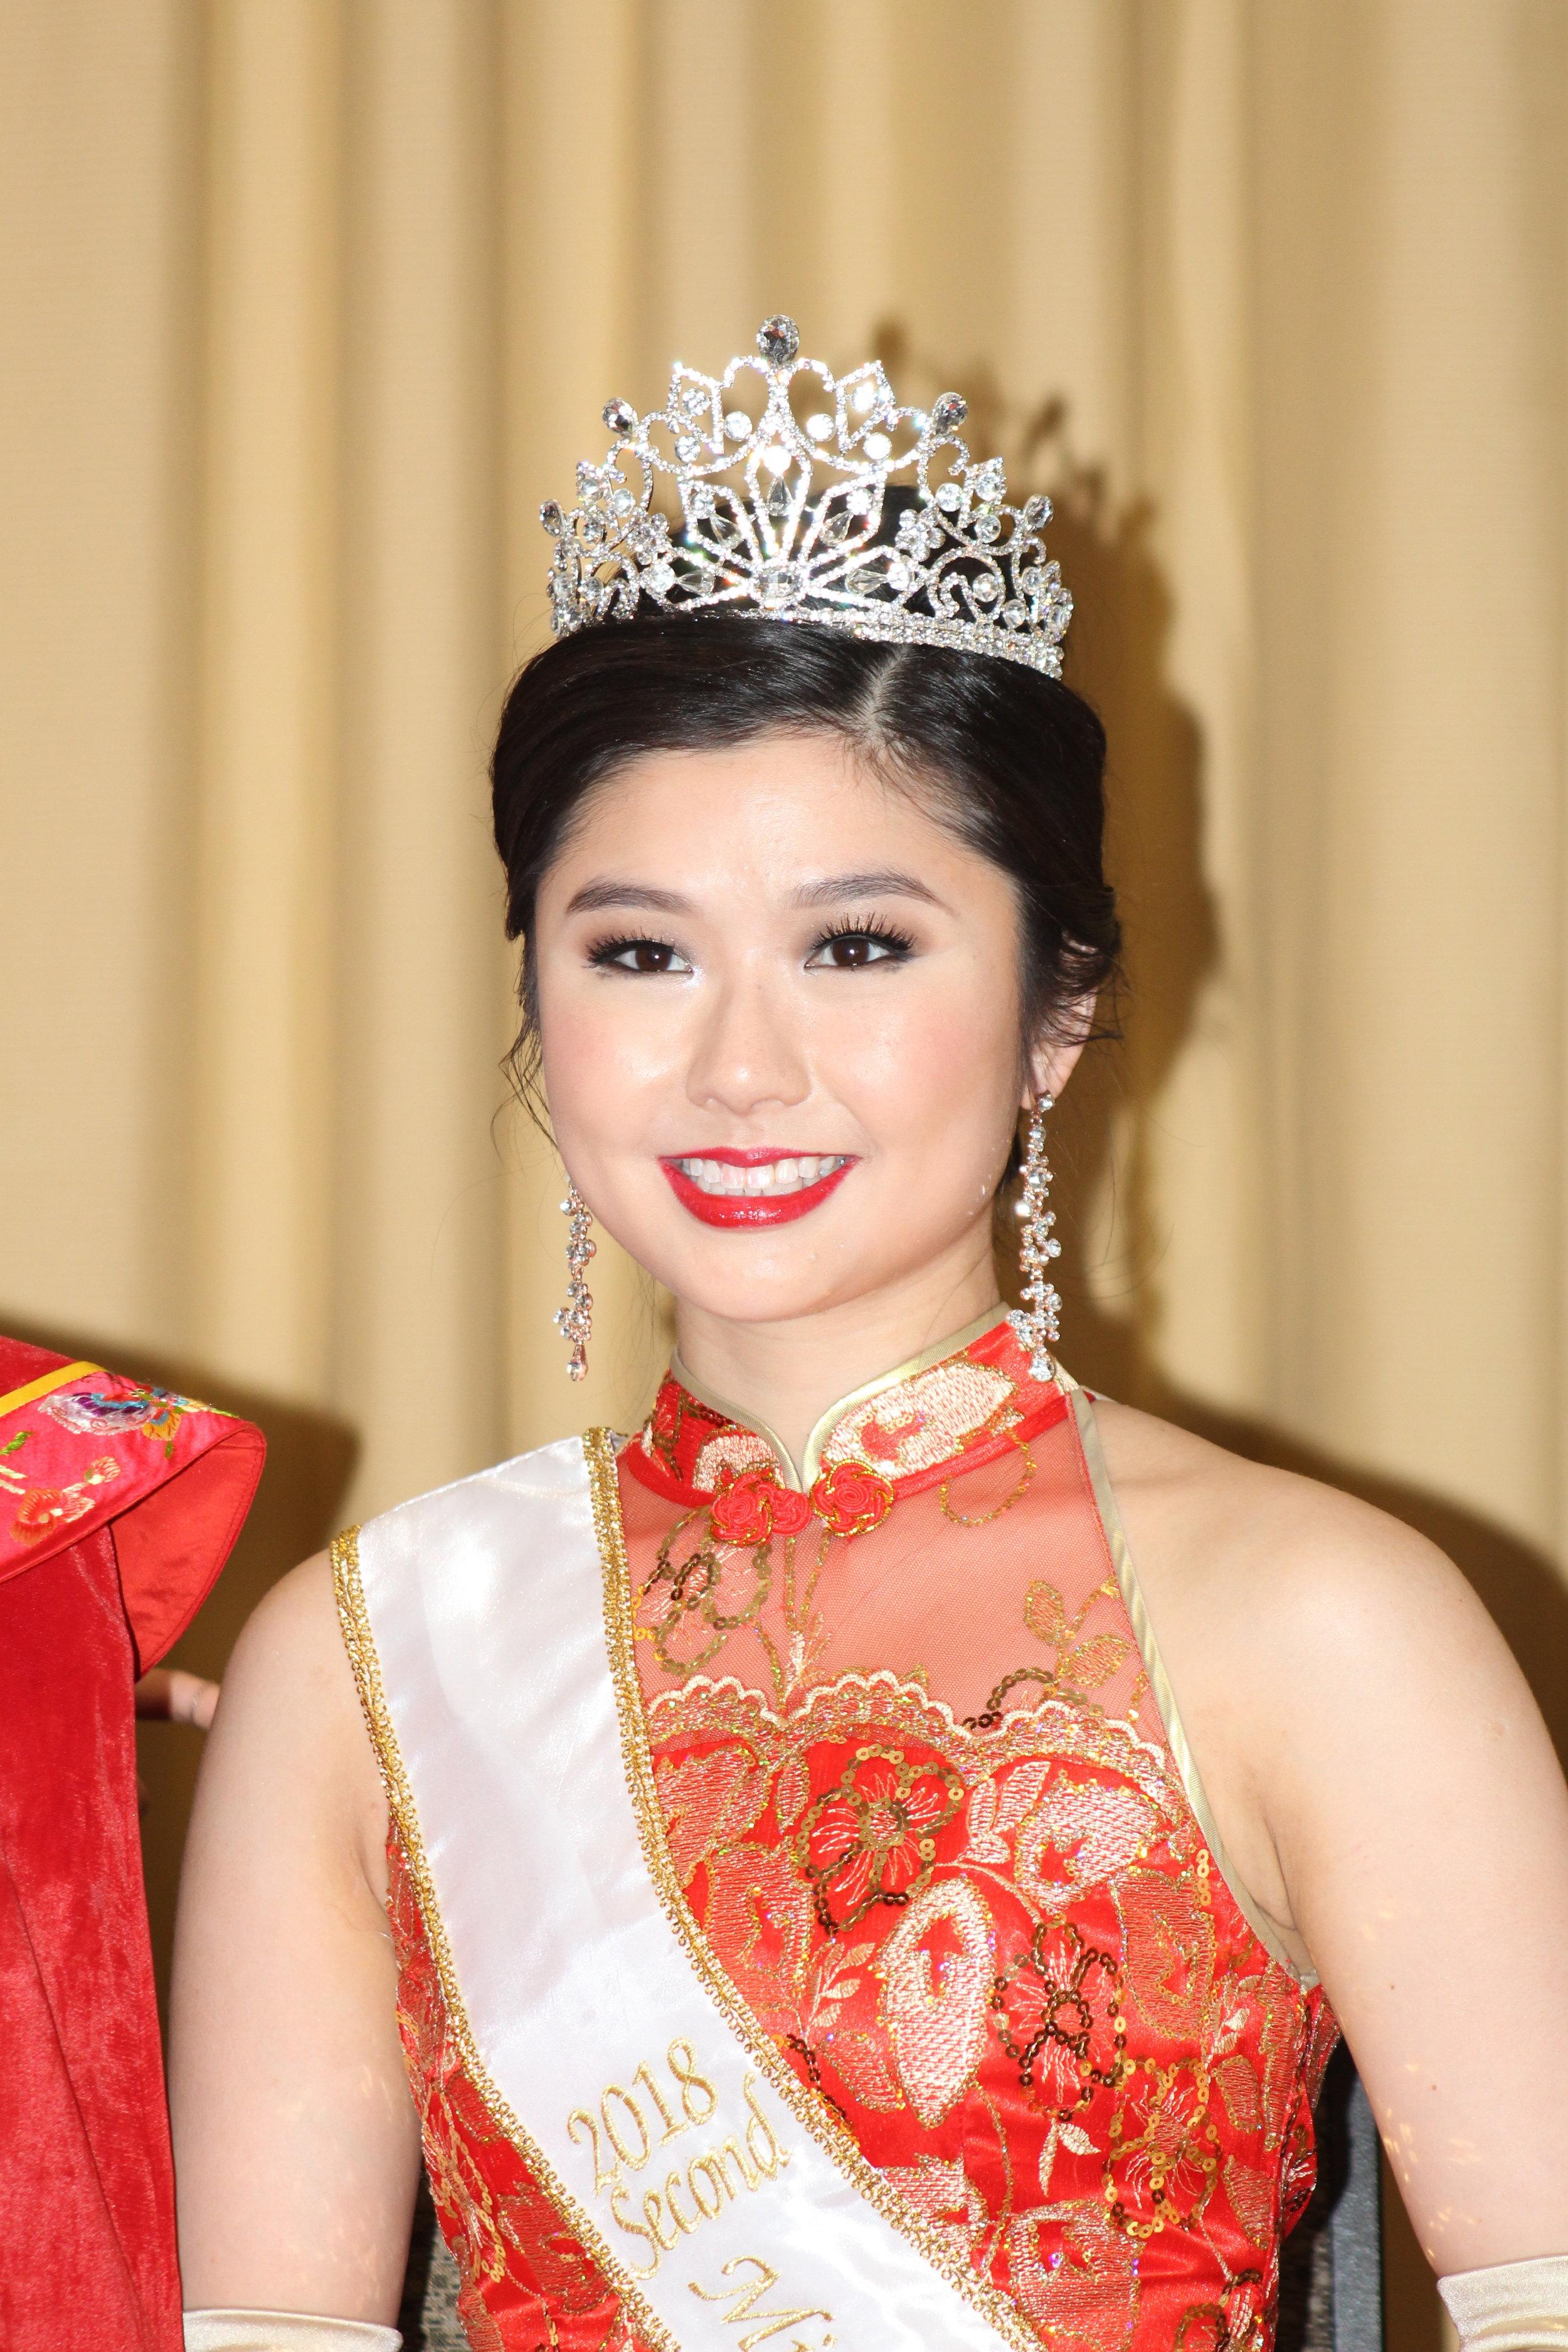 Second Princess, Jasmine Lam